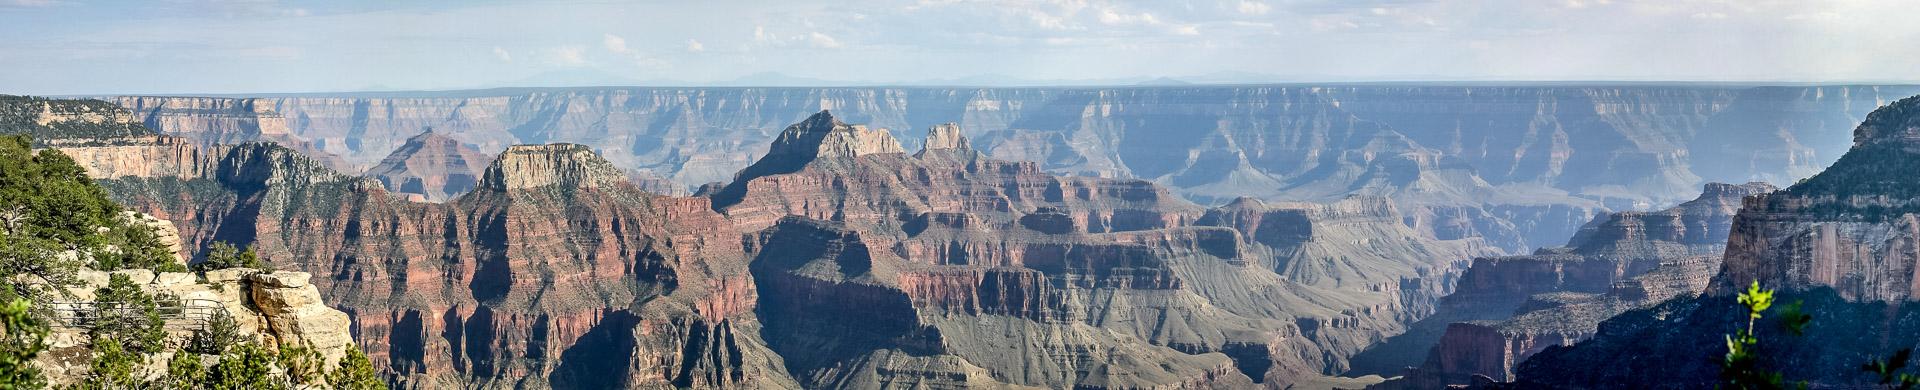 Grand Canyon: Bright Angel Canyon